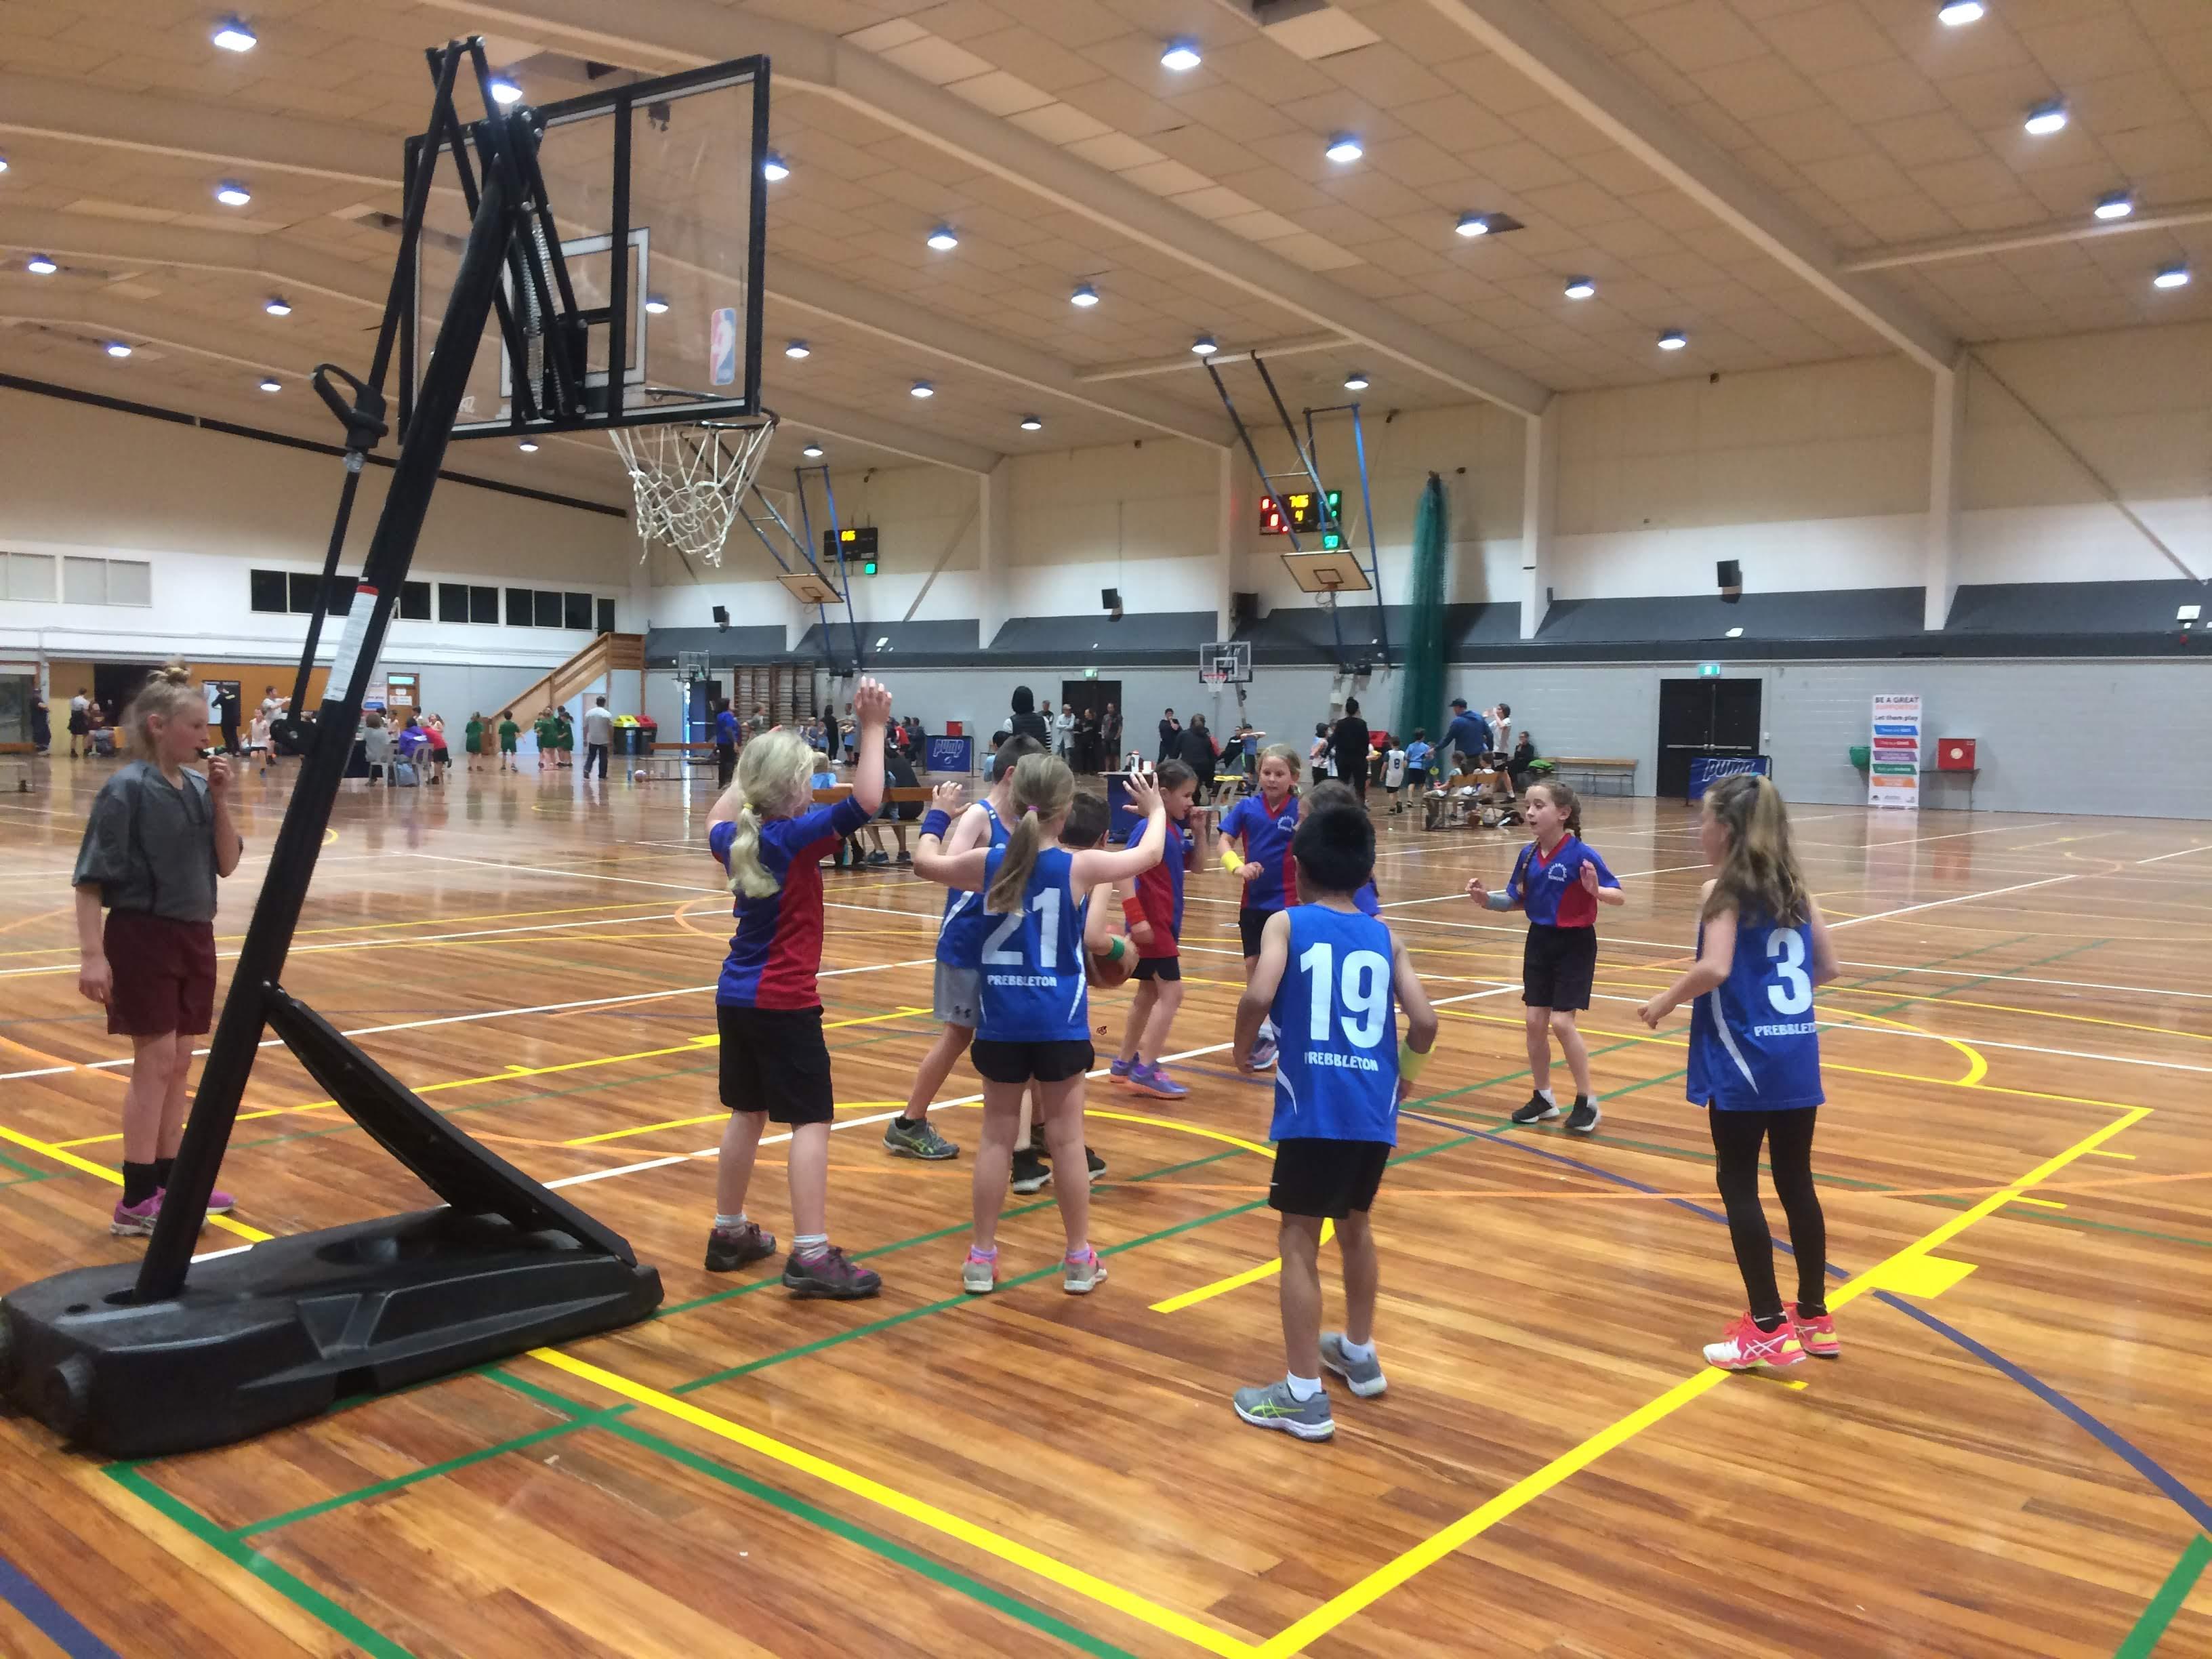 Somerfield Te Kura Wairepo basketball girls playing a match in an indoor court